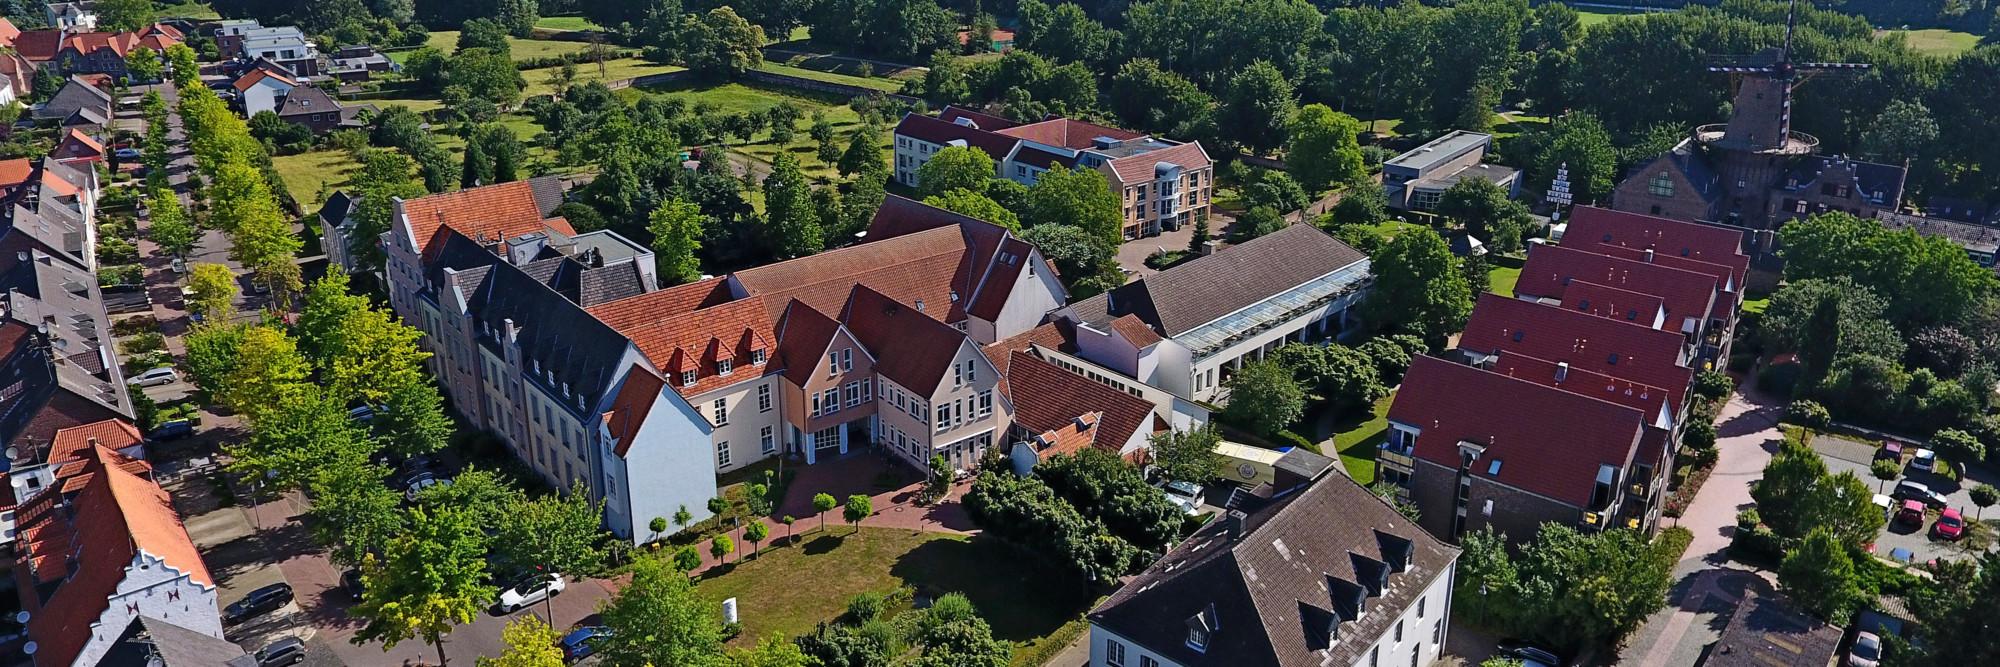 Luftaufnahme des St. Nikolaus-Hospitals Kalkar.